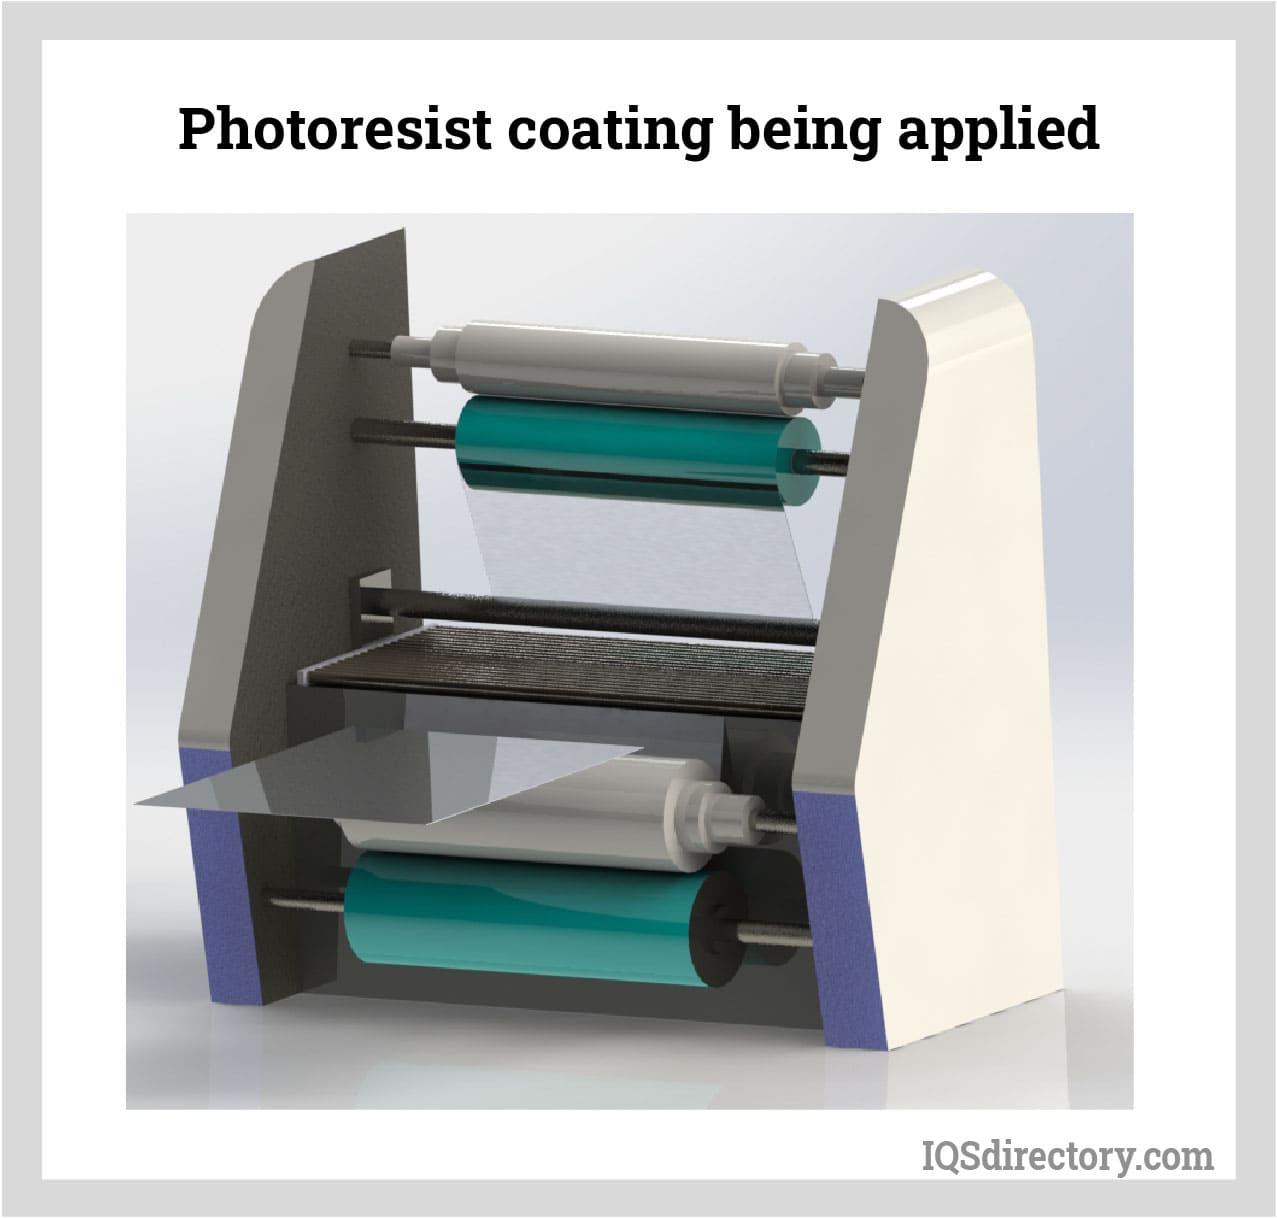 Photoresist Coating Being Applied